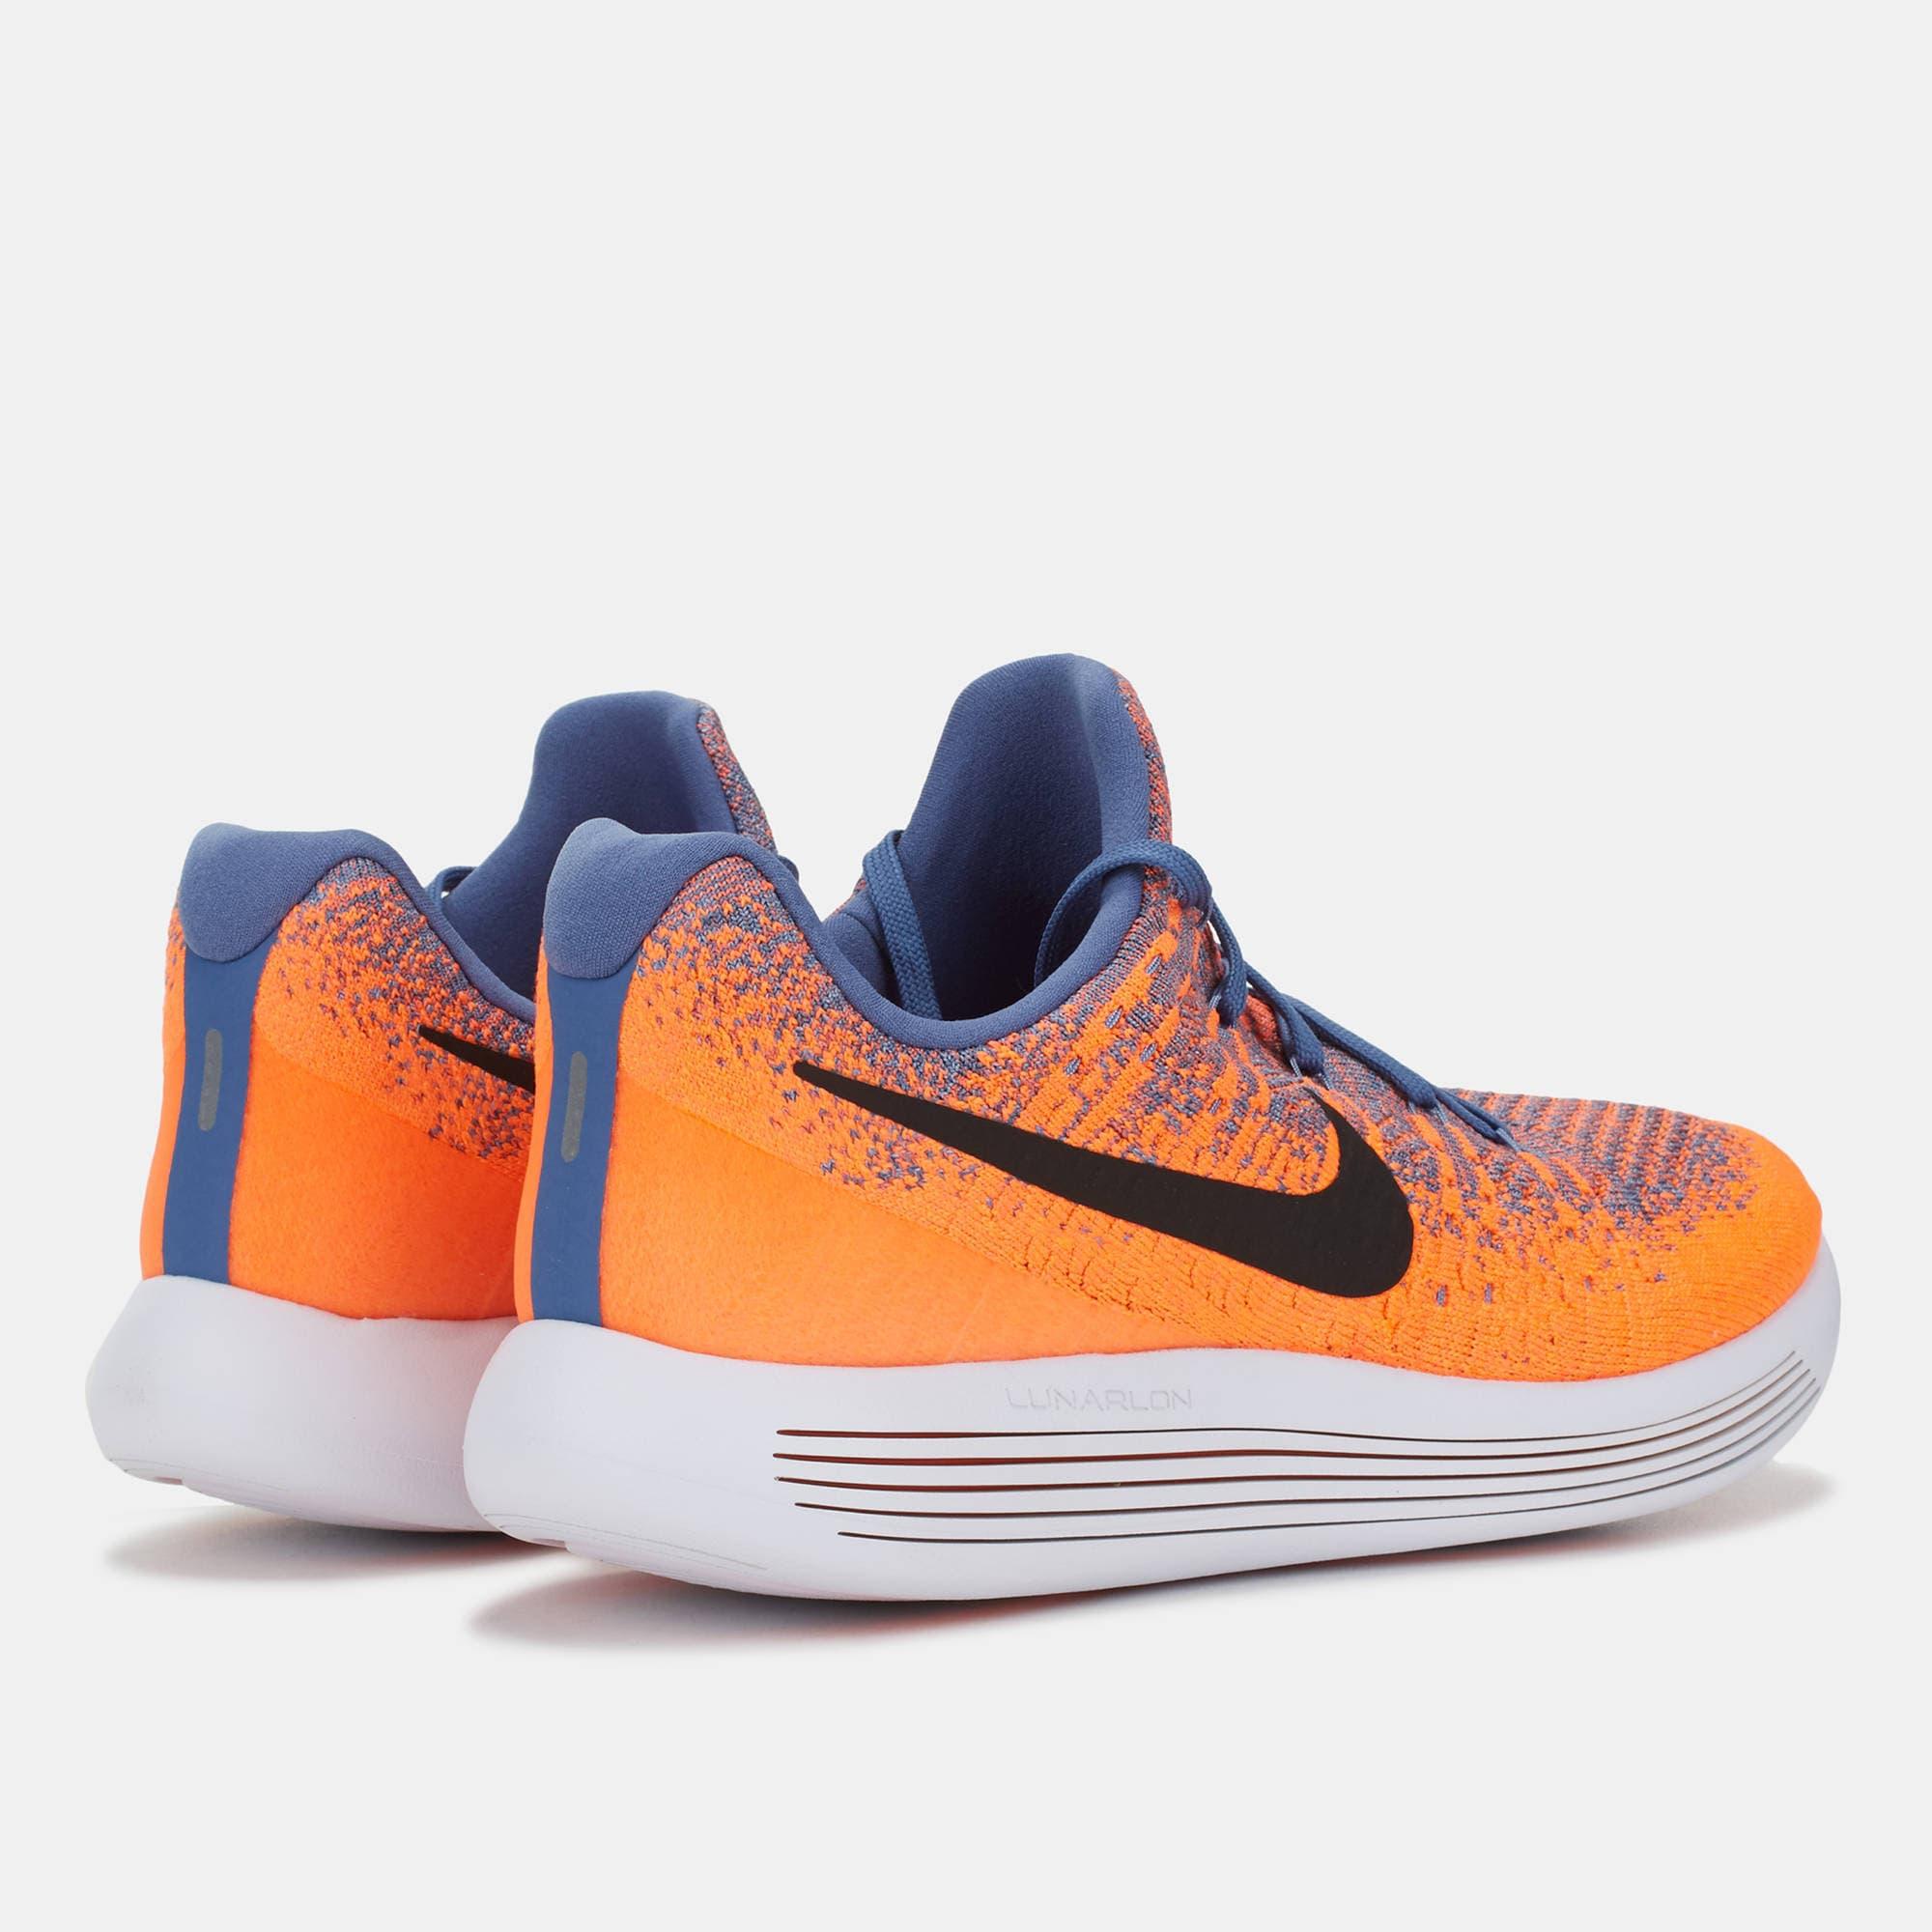 ... Nike Lunarepic Low Flyknit 2 Paramount Blue Black Max Orange -  Blanja.com ... 1c1714e32a